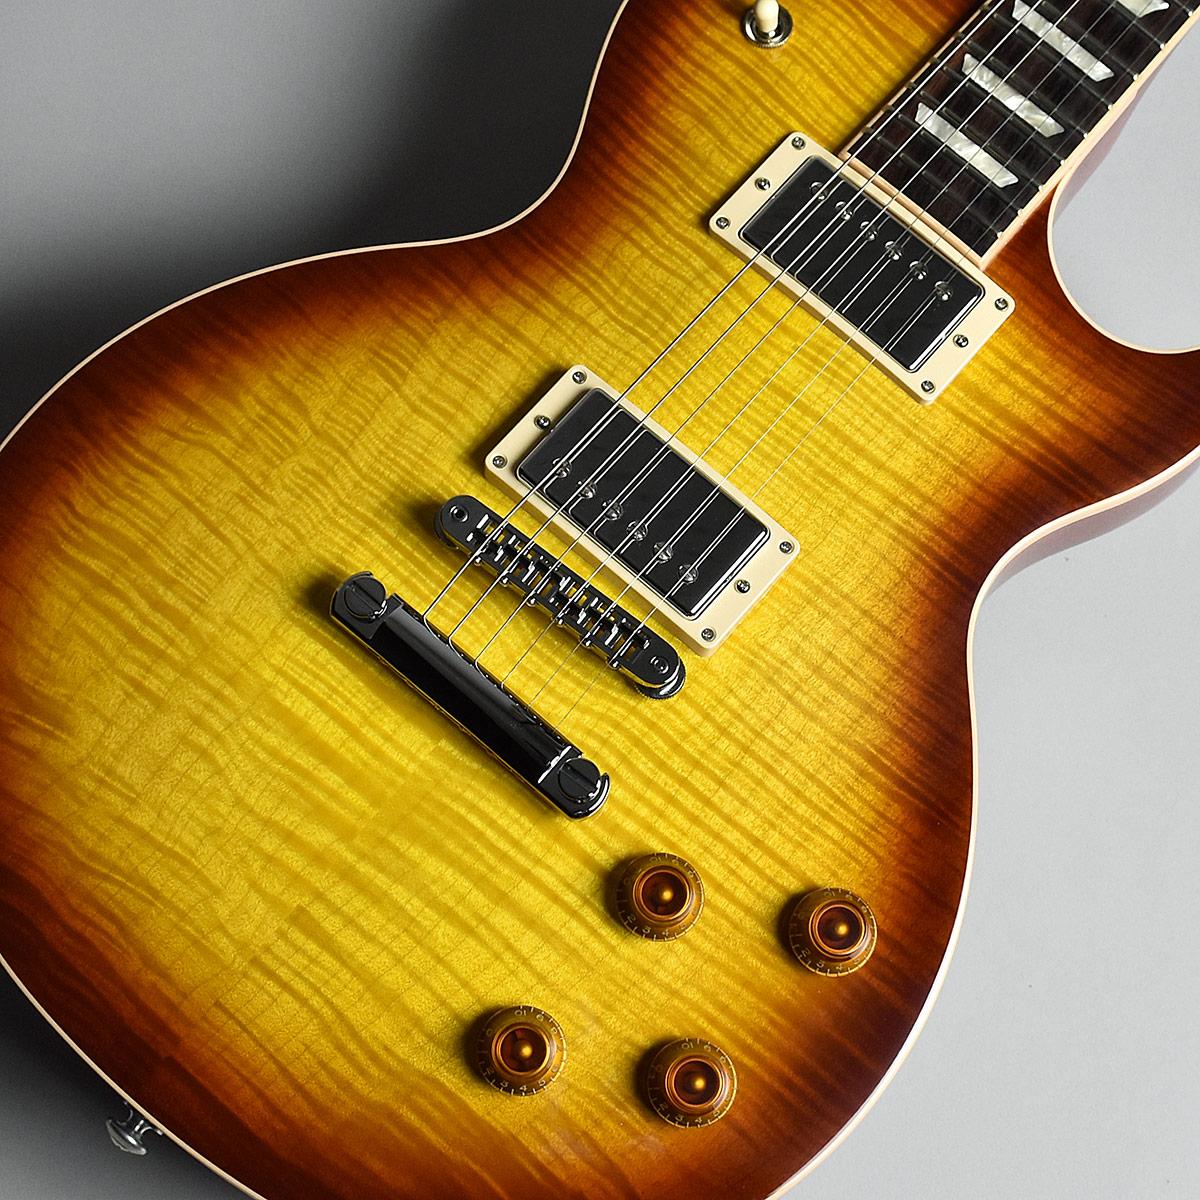 Gibson Les Paul Standard 2017 Iced Tea S/N:170026145  2017年限定カラーモデル 【ギブソン】【未展示品】